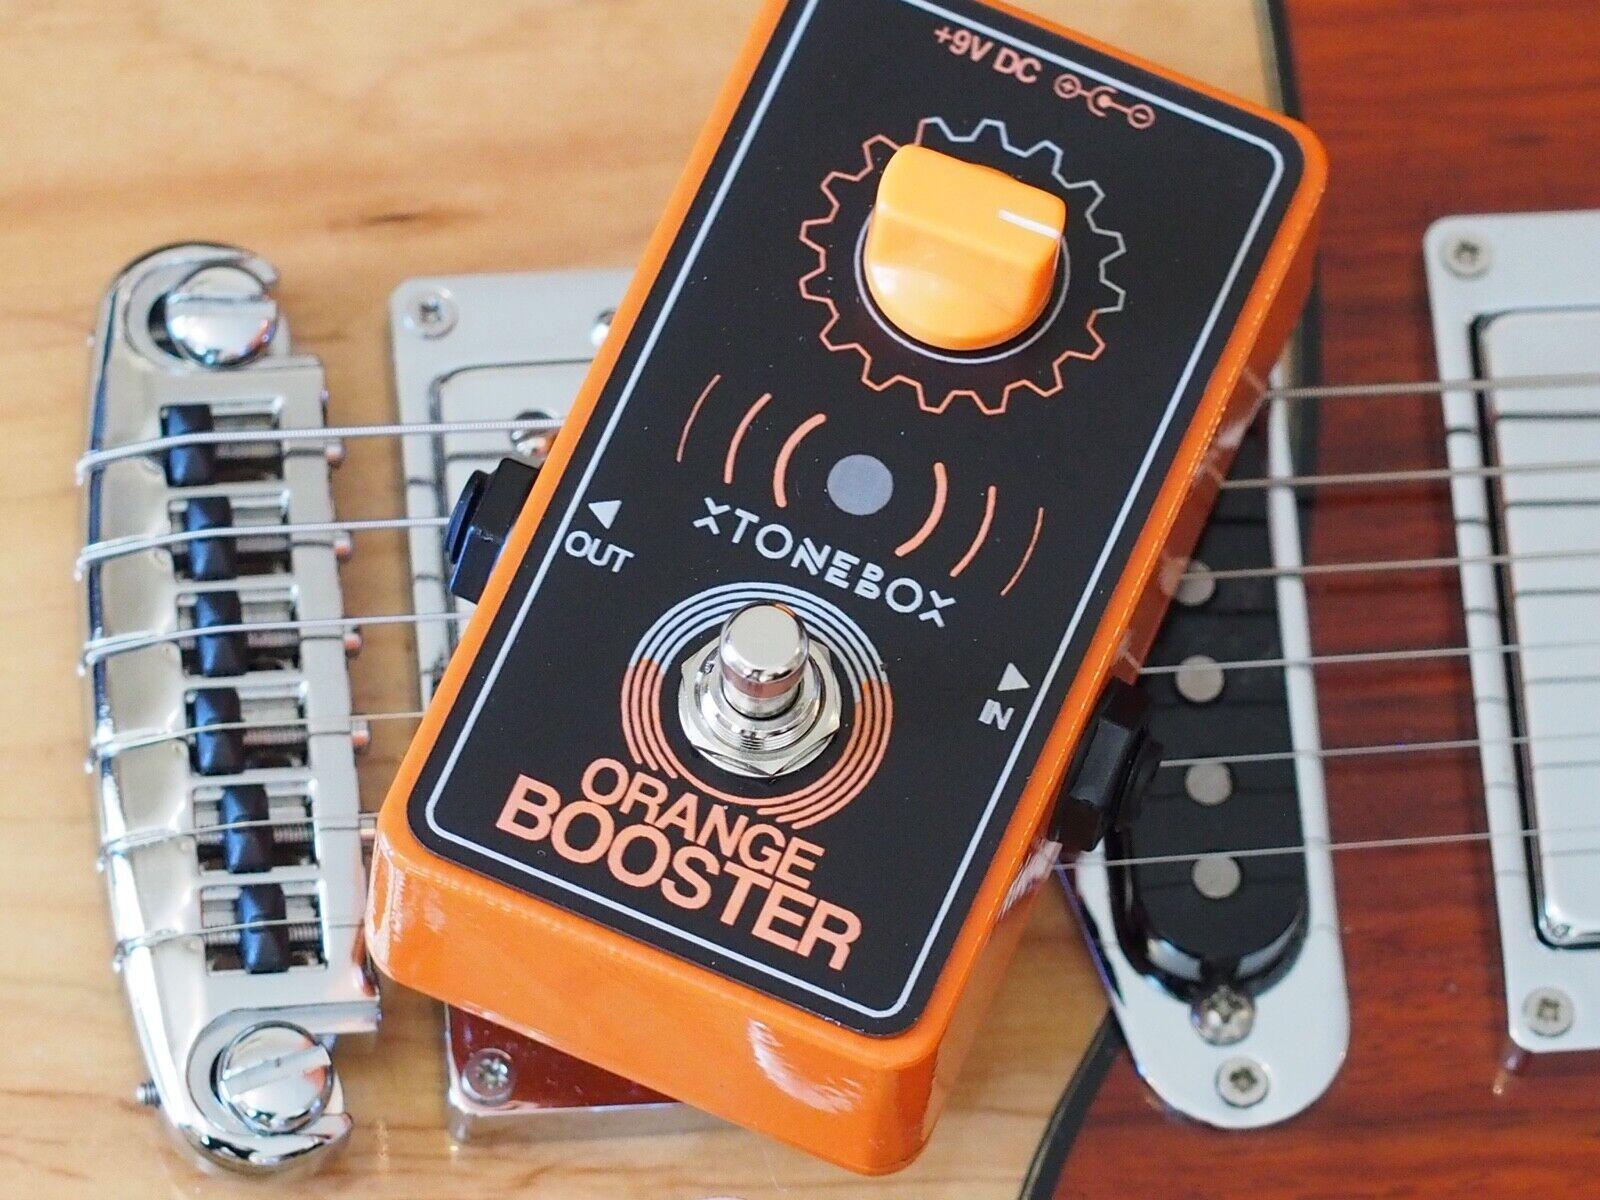 Xtonebox Boutique Orange Booster Guitar Pedal